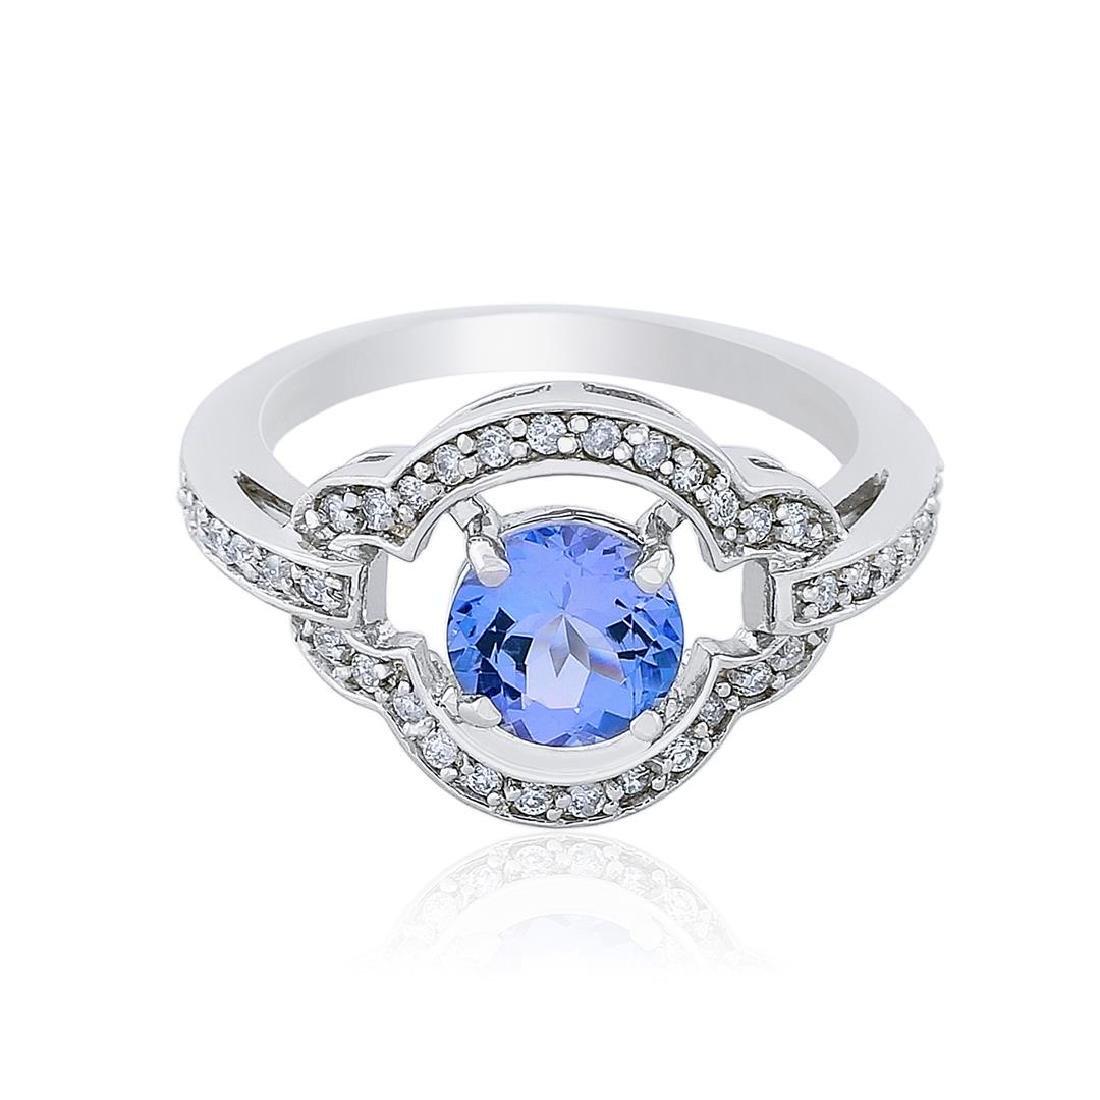 14KT White Gold 1.29 ctw Tanzanite and Diamond Ring